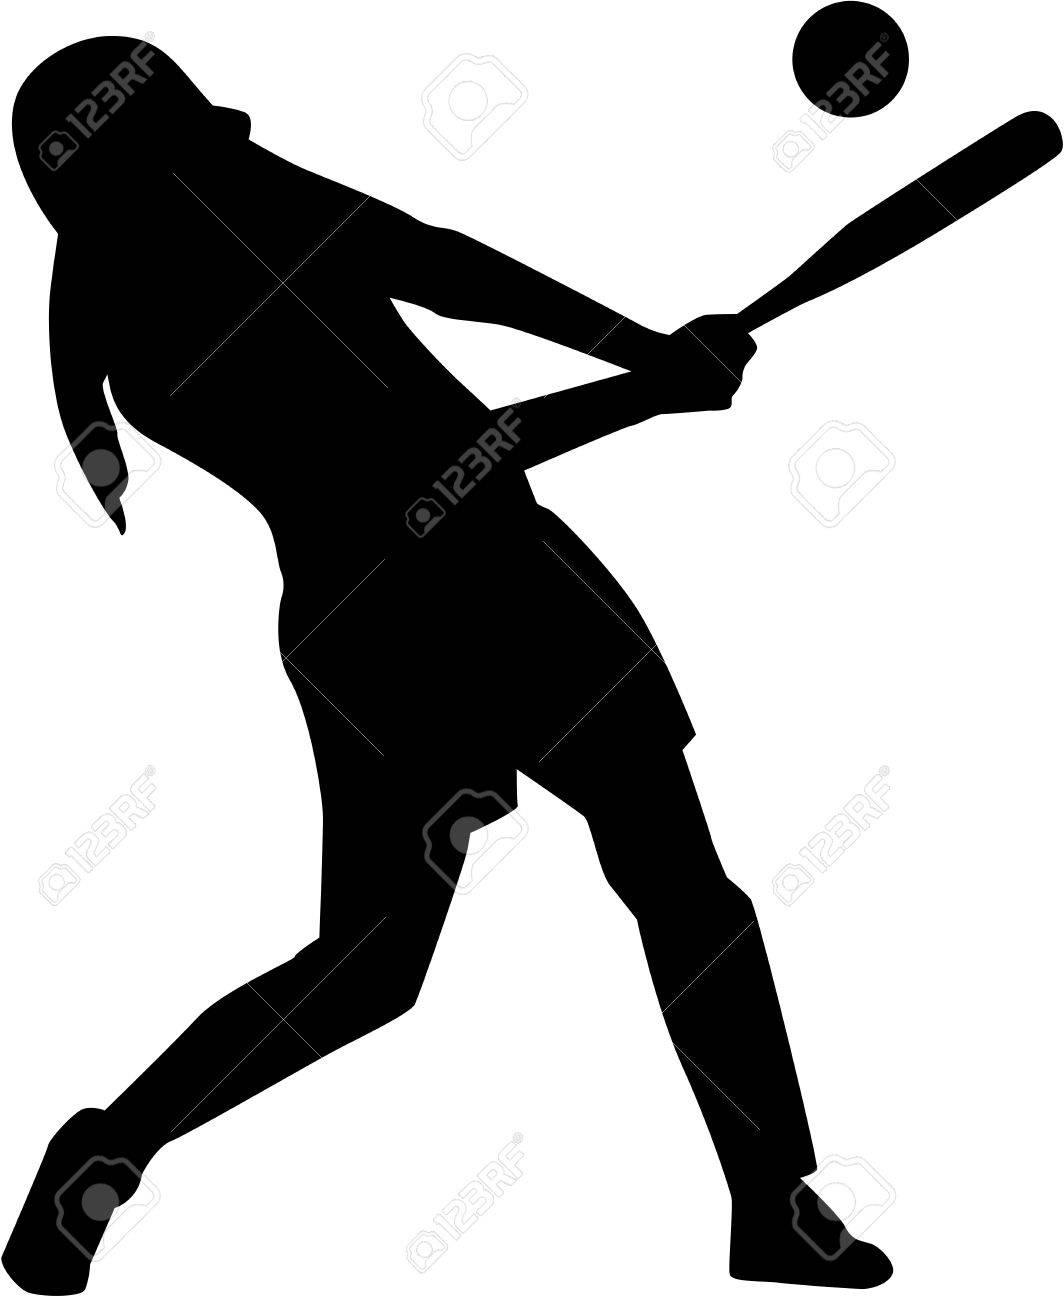 Softball batter woman silhouette - 70069070